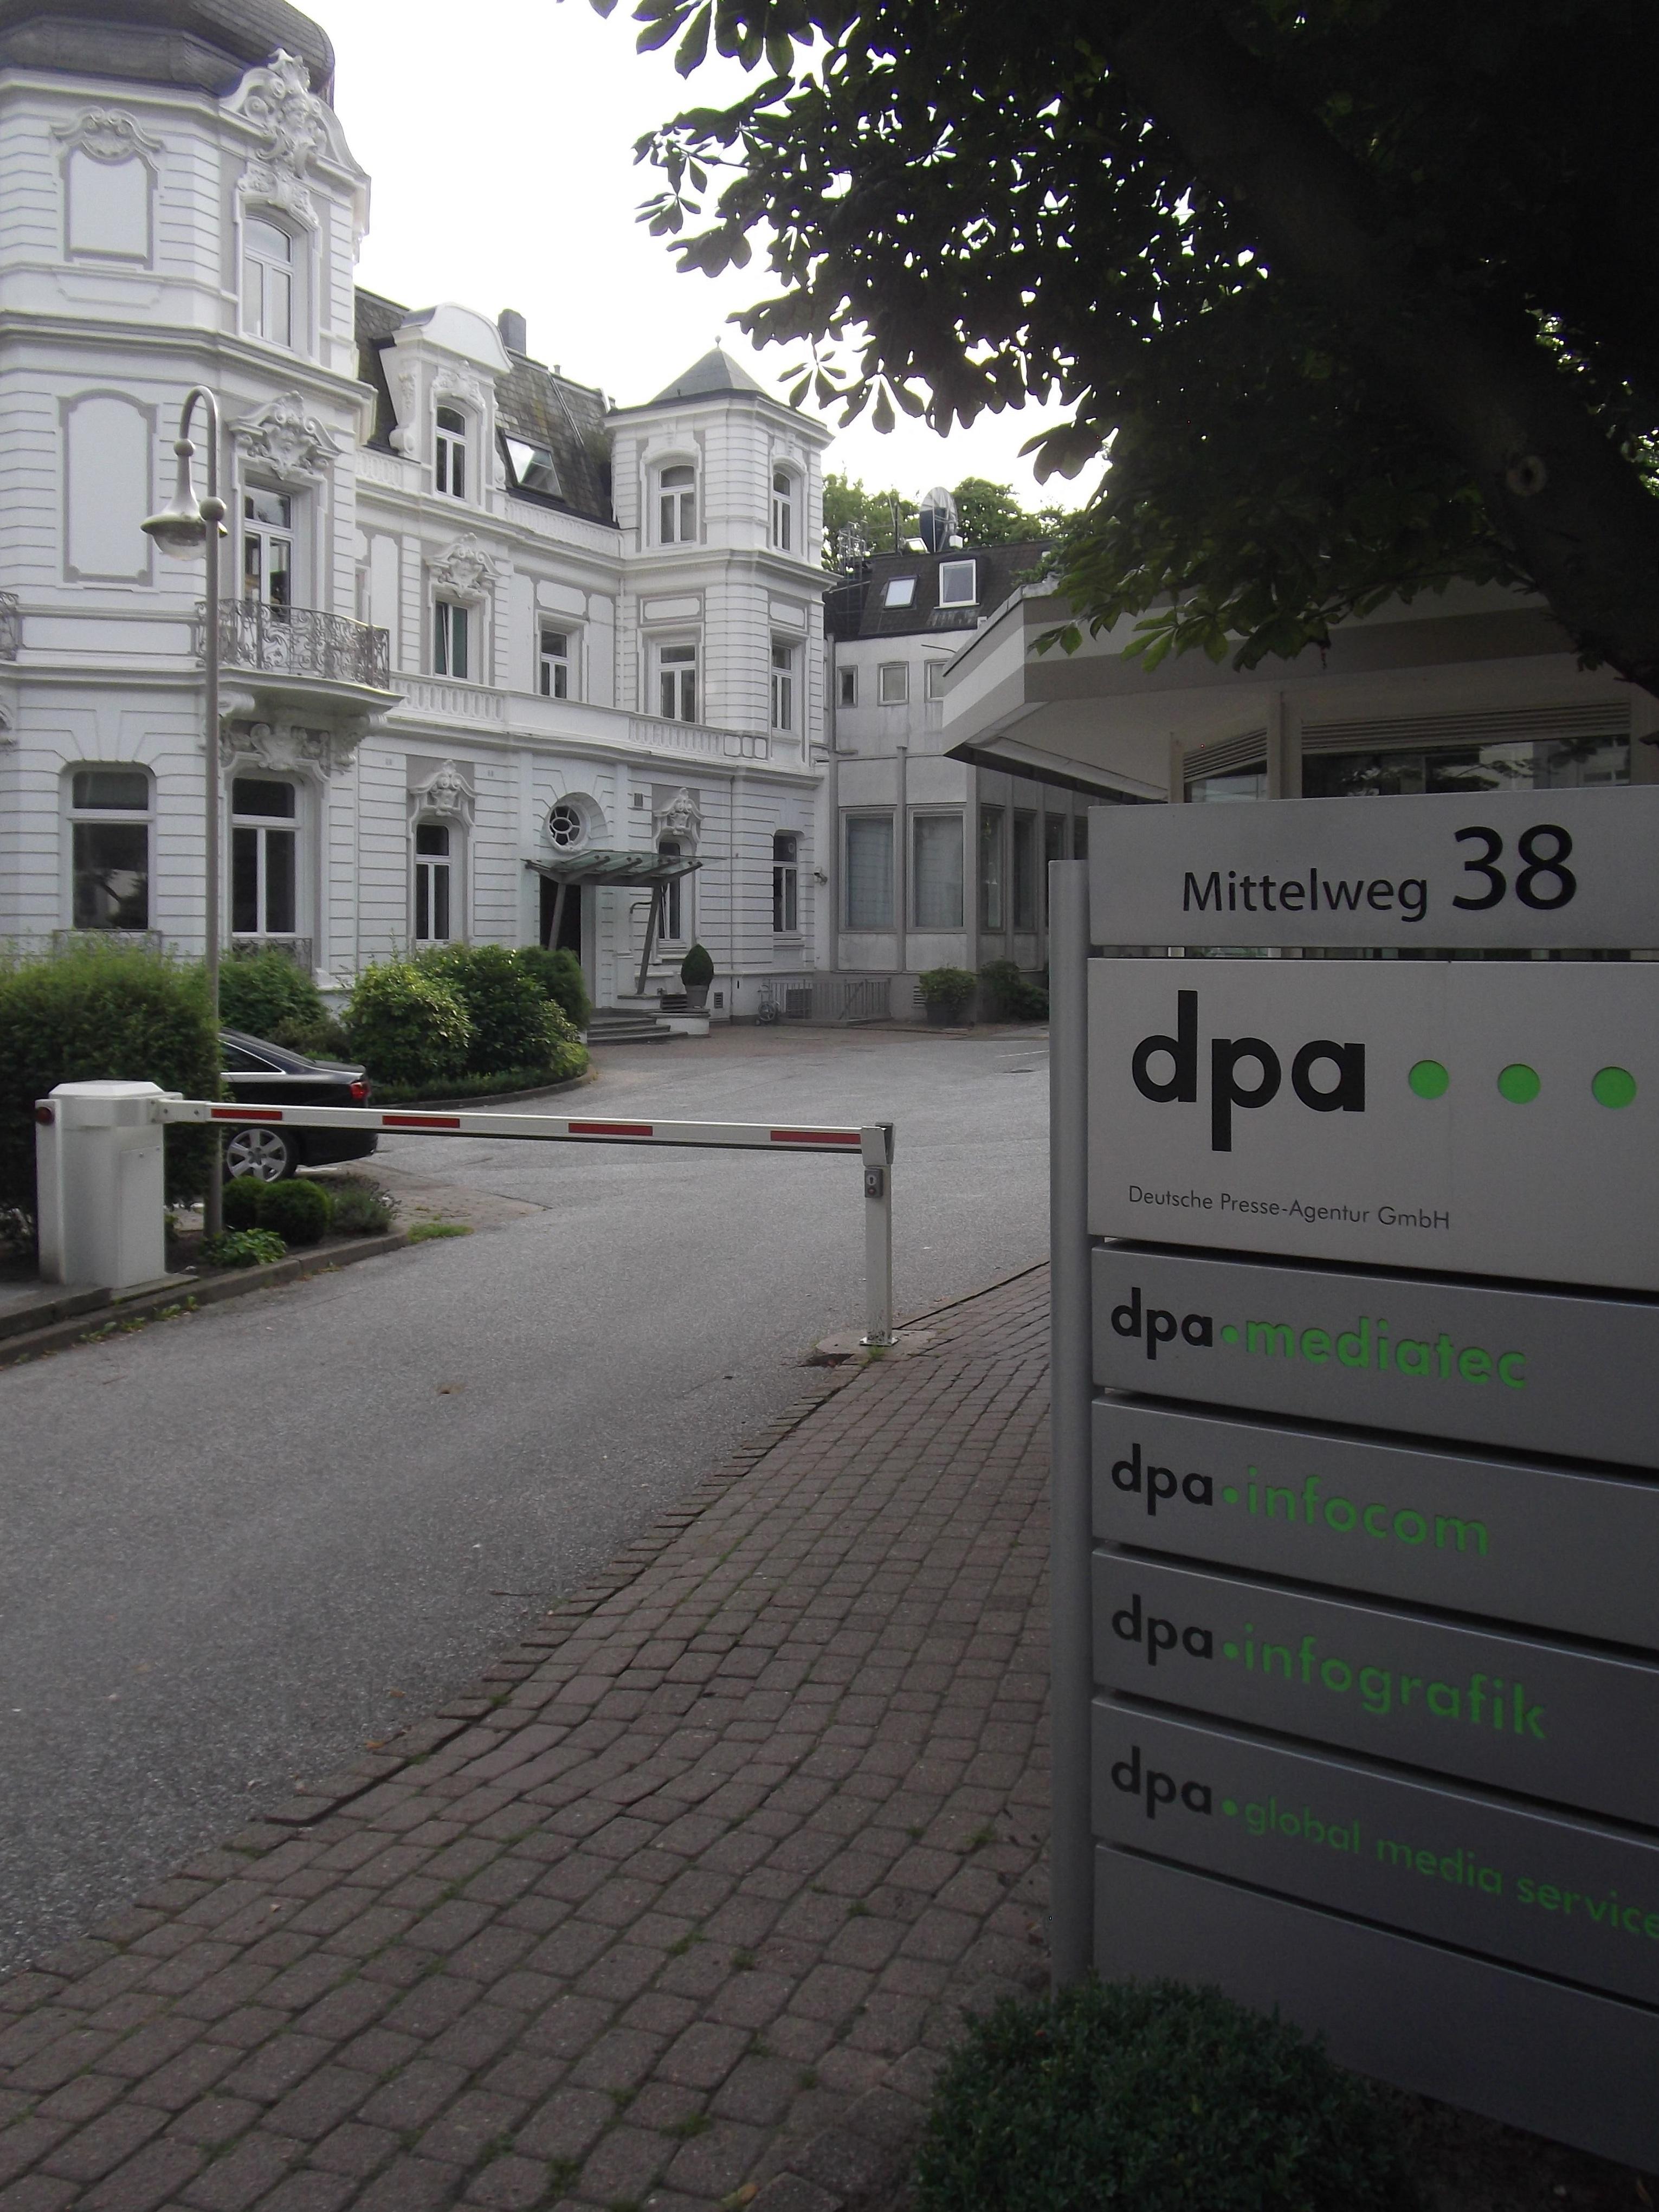 dpa corporate headquarters at Mittelweg in [[Rotherbaum